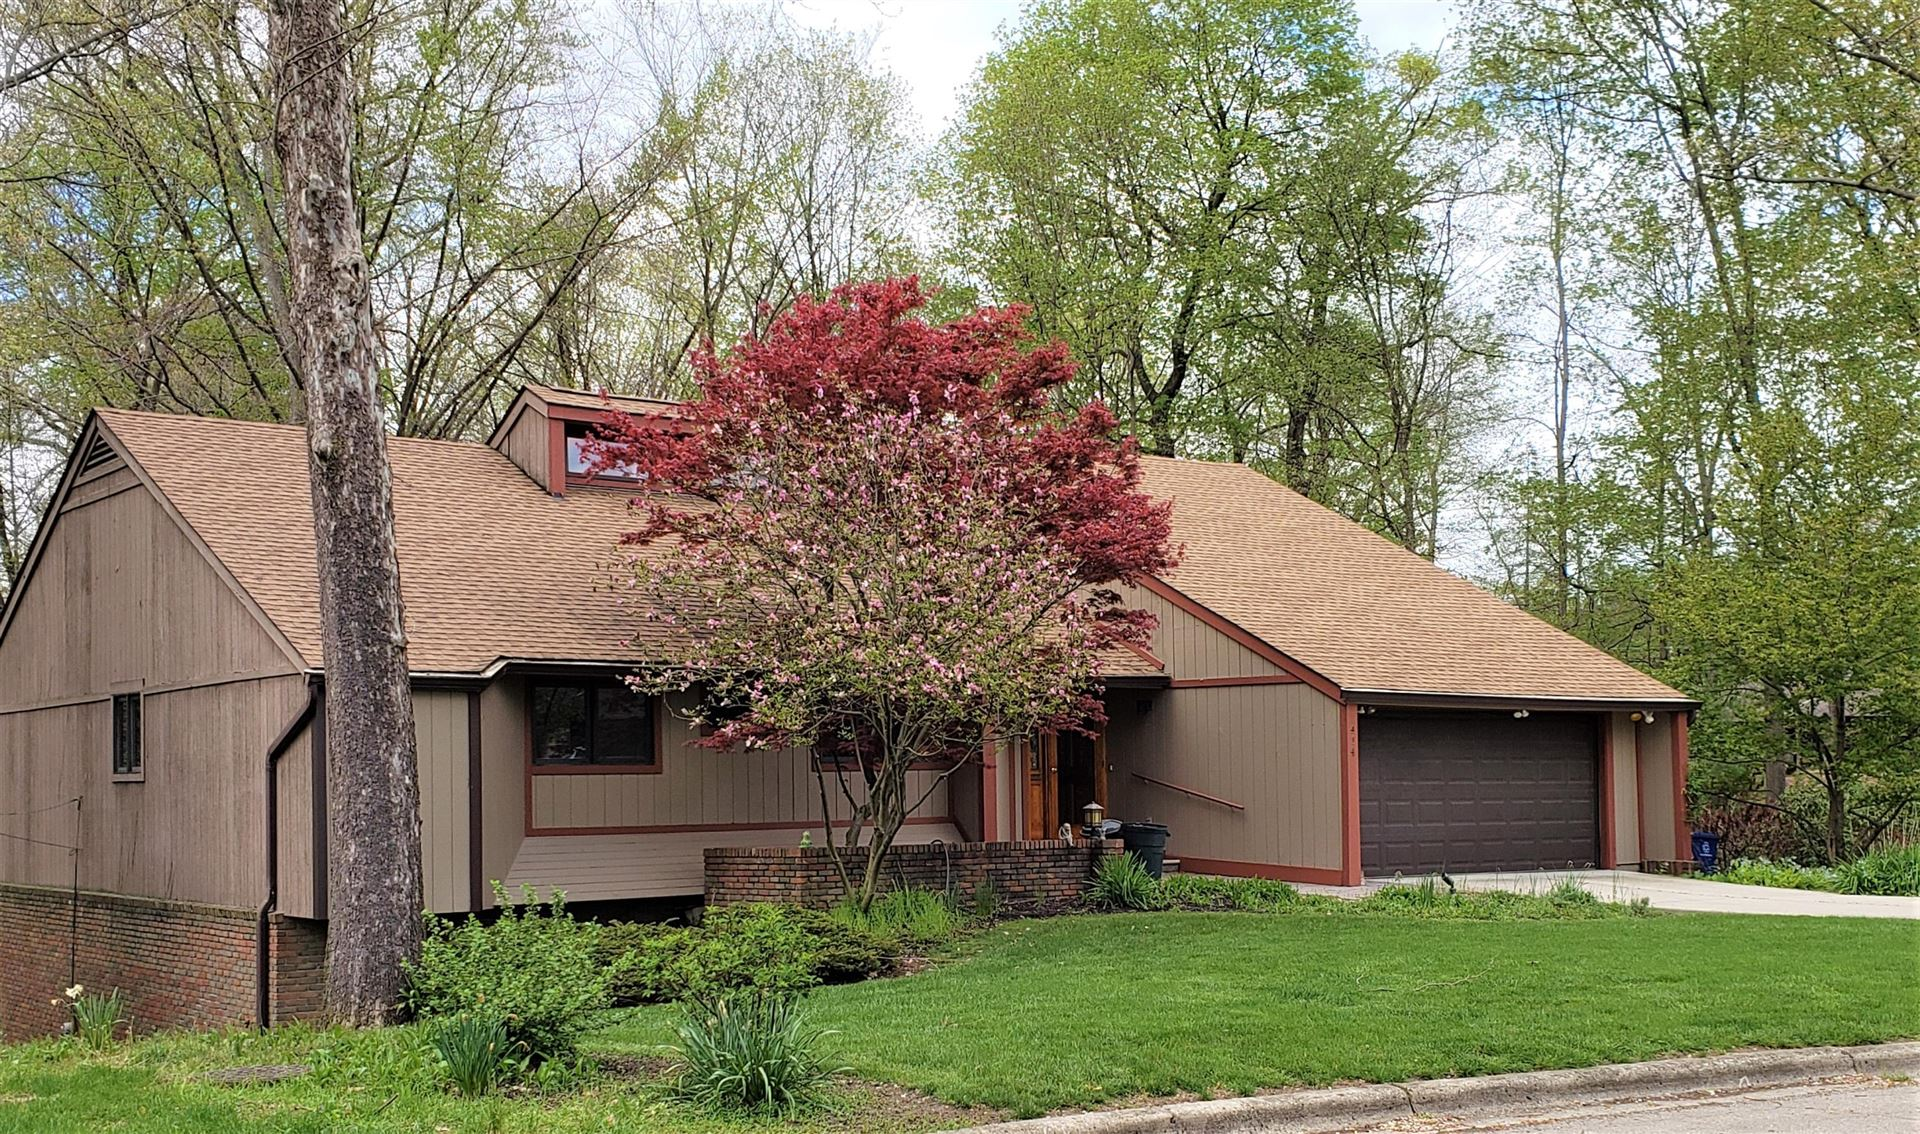 414 Village Drive, Columbus, OH 43214 - MLS#: 220013435